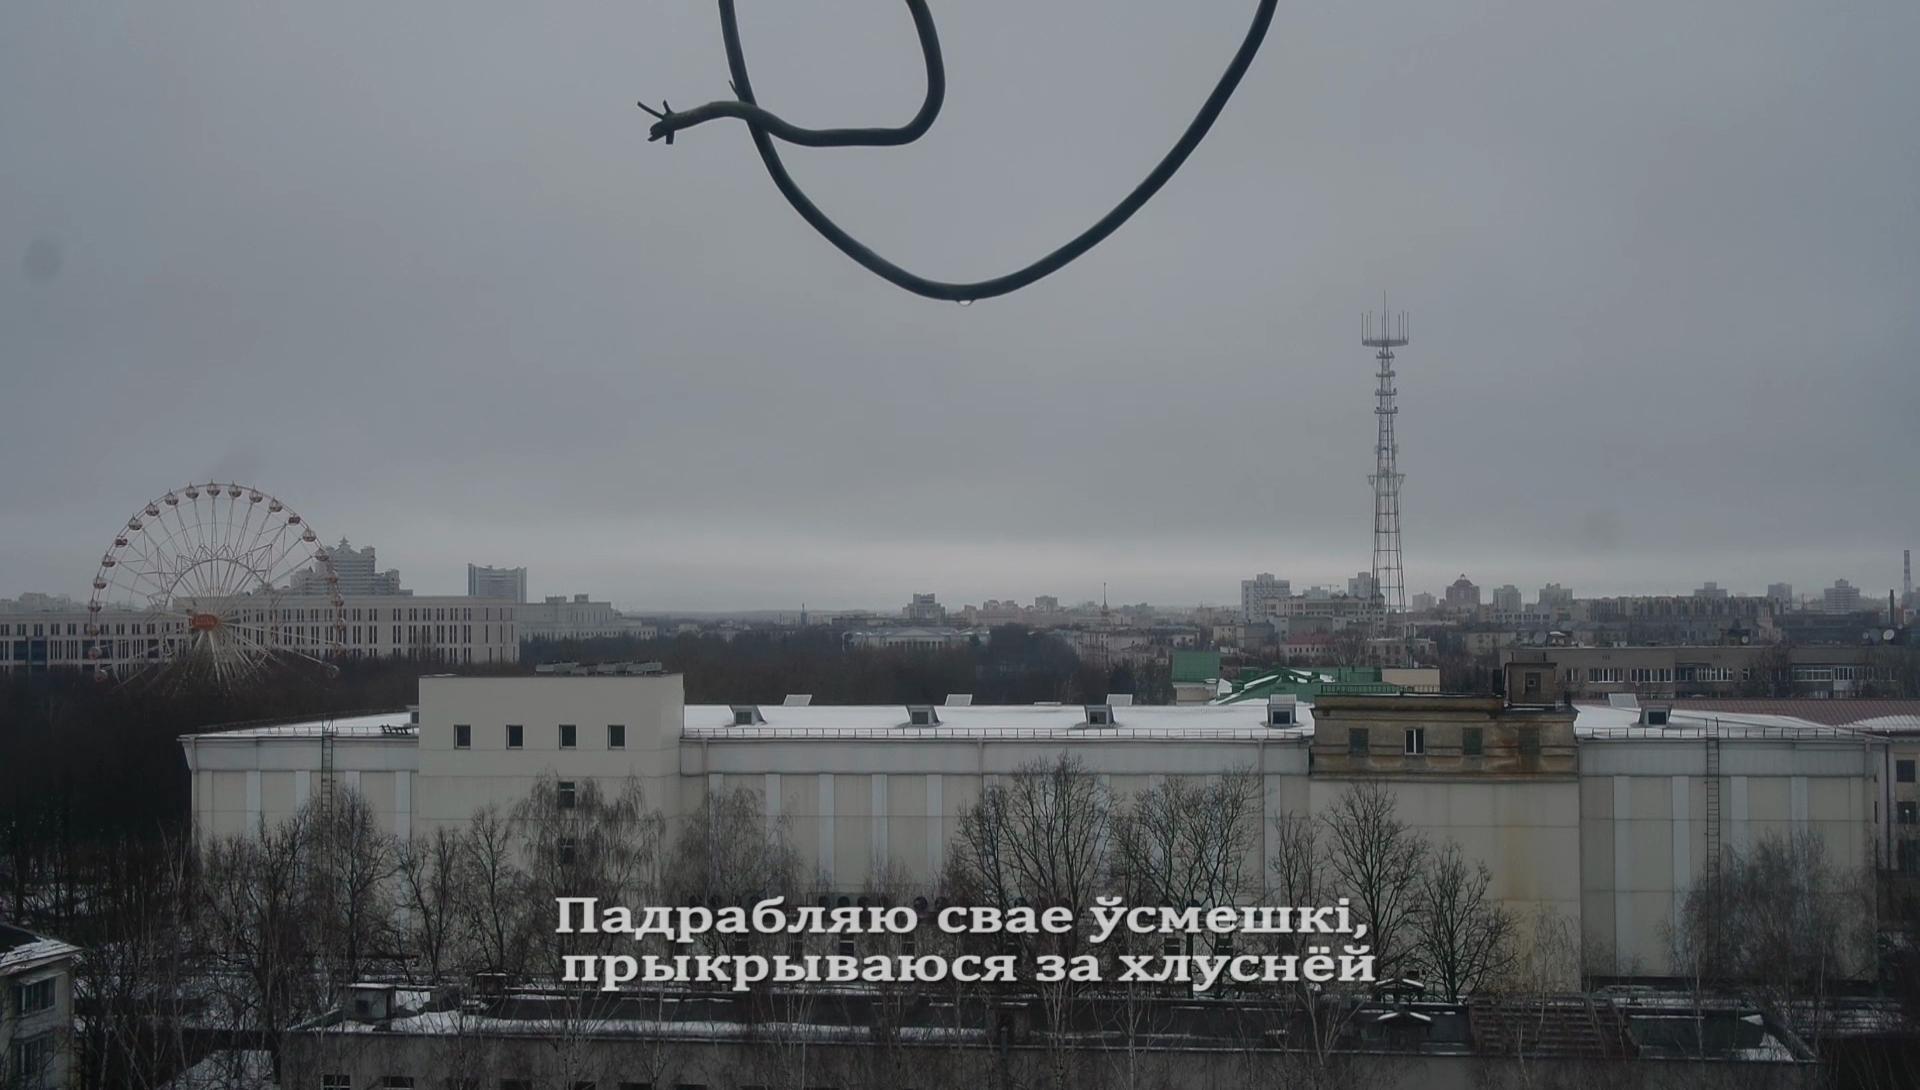 Low Skies Music Video Direction Director Mario Dzurila Lacika And The Hookers LATH Belarus Berlin